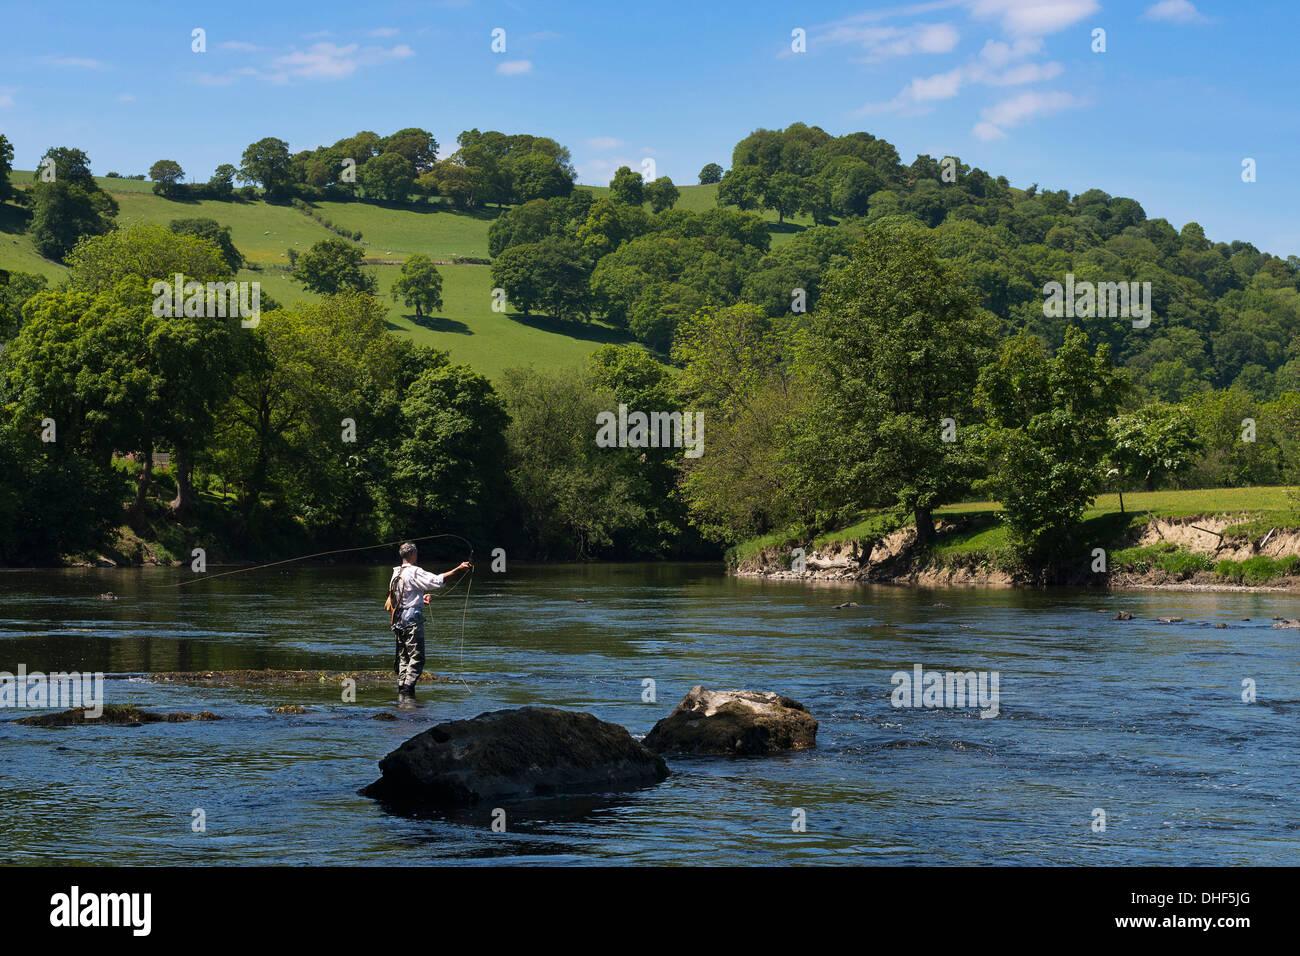 Man fishing in River Wye, Herefordshire, England, UK - Stock Image